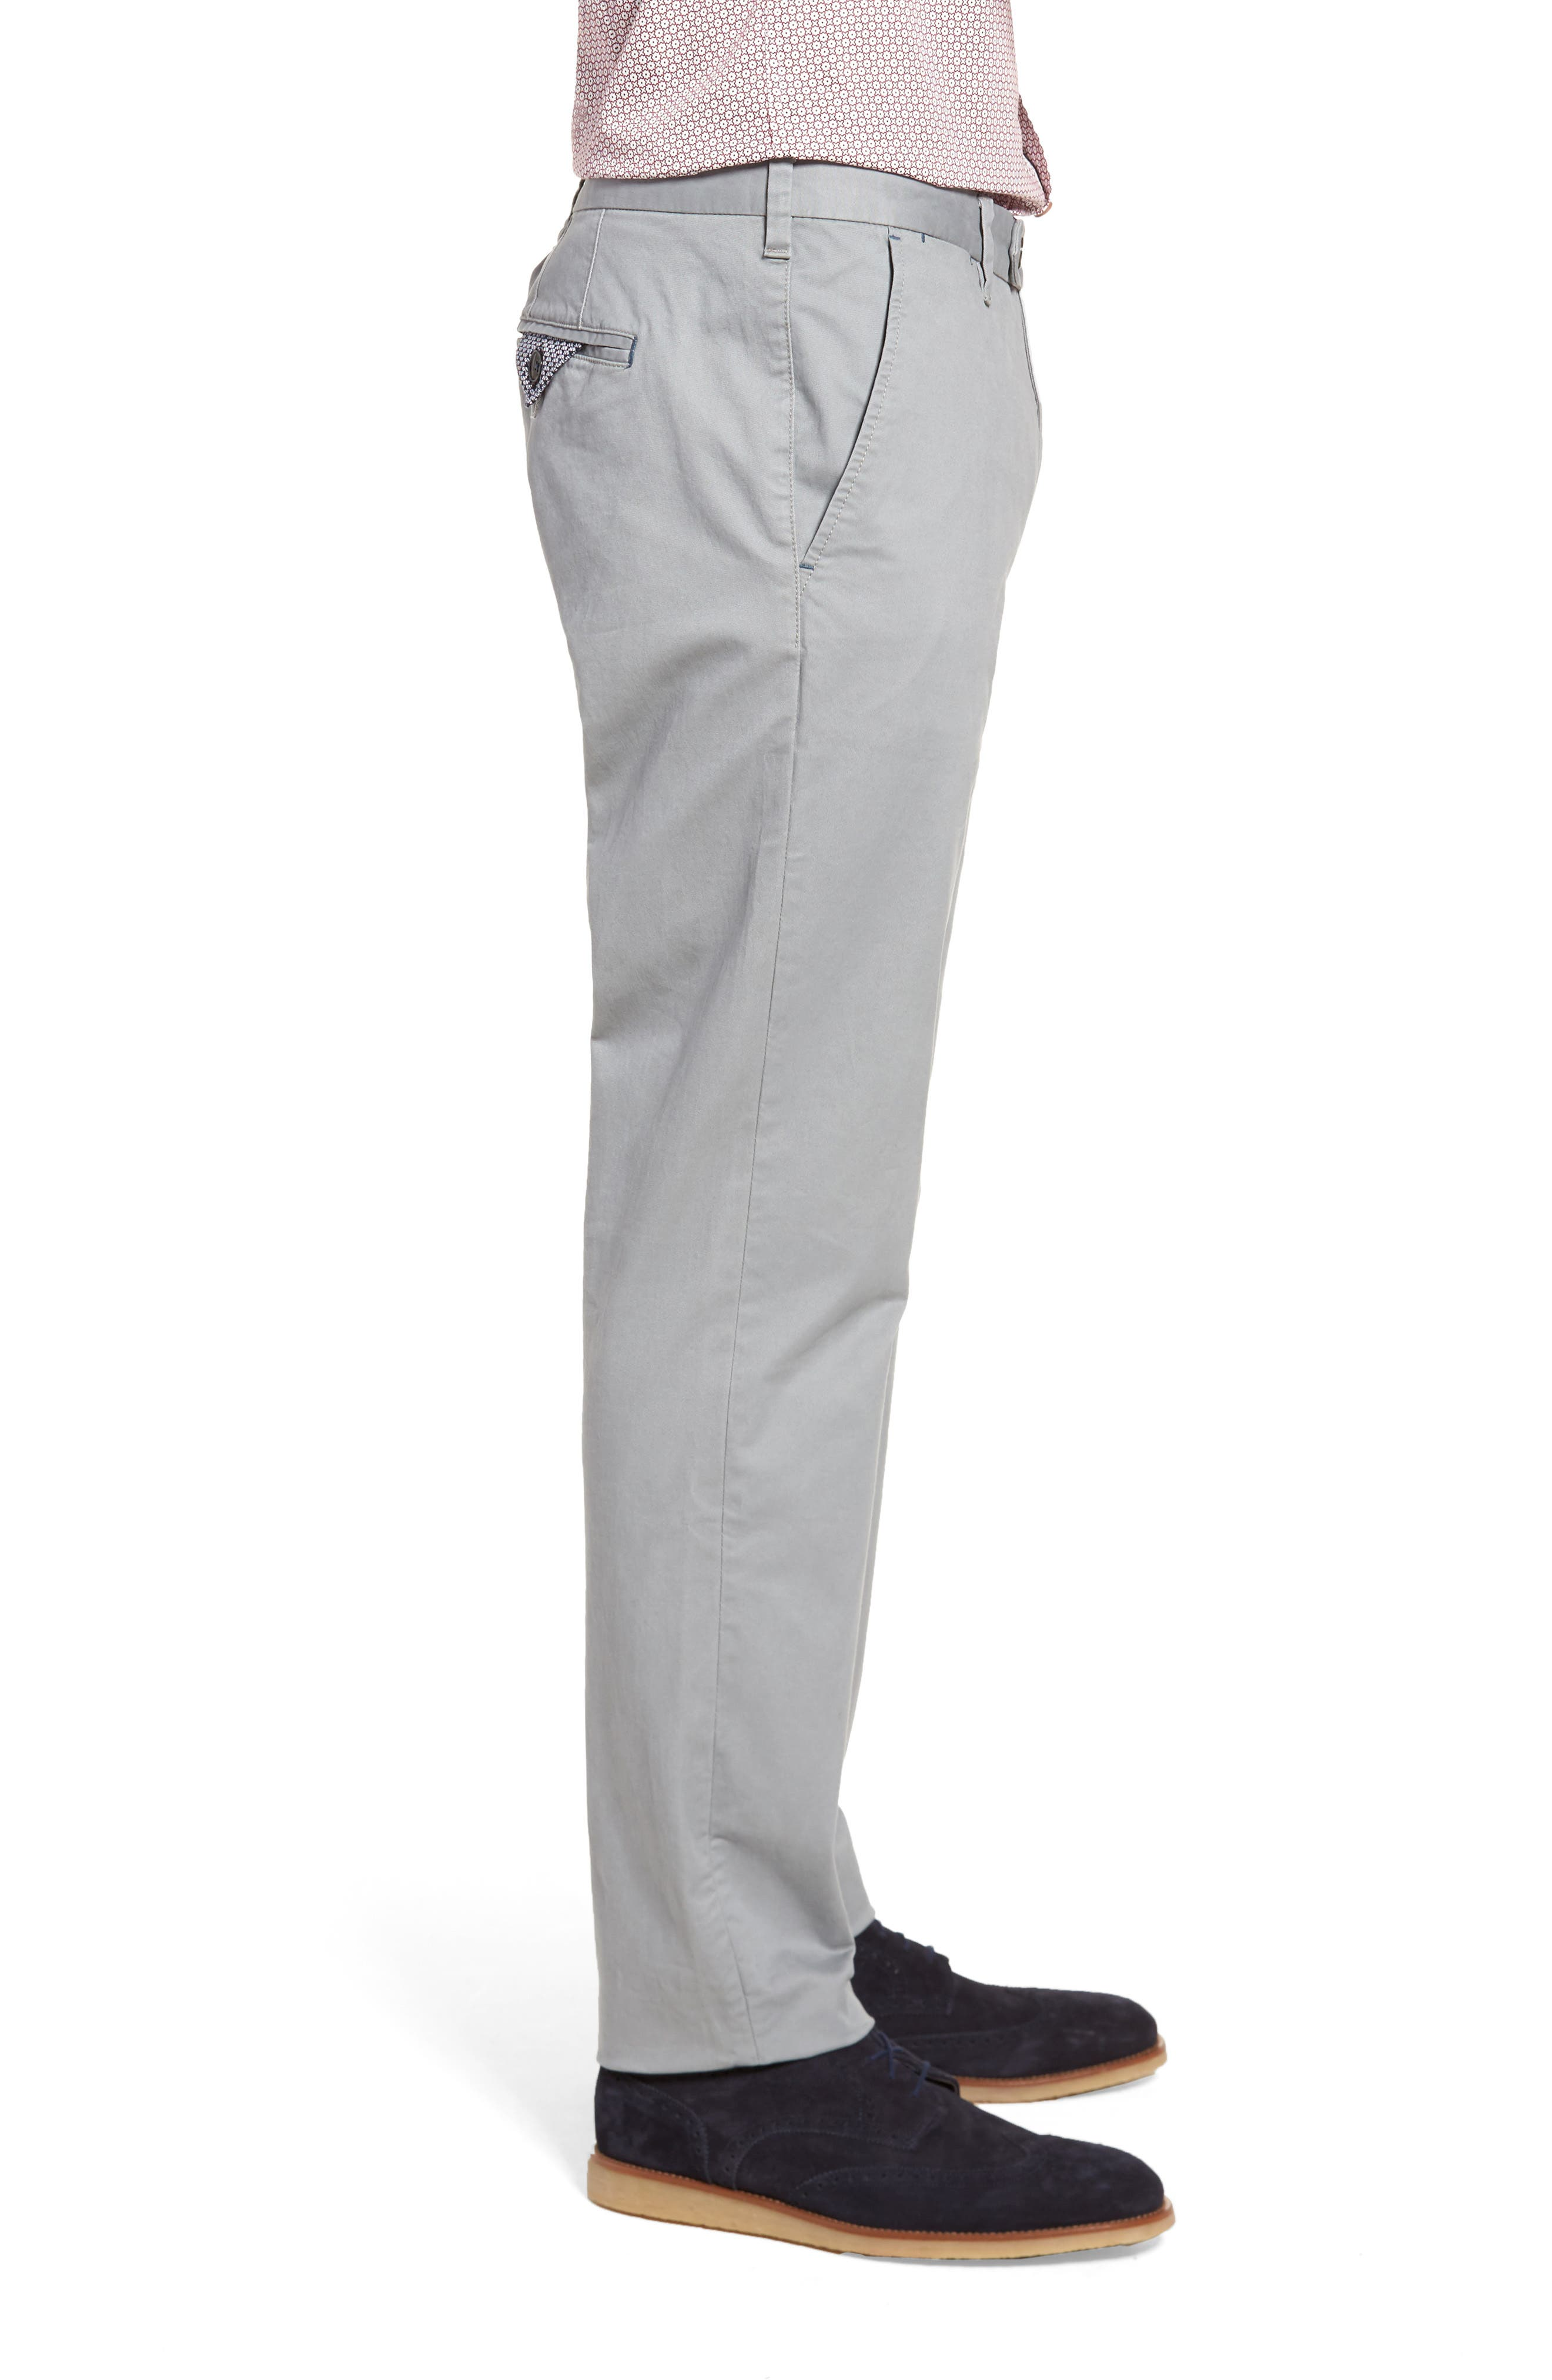 Procor Slim Fit Chino Pants,                             Alternate thumbnail 3, color,                             050